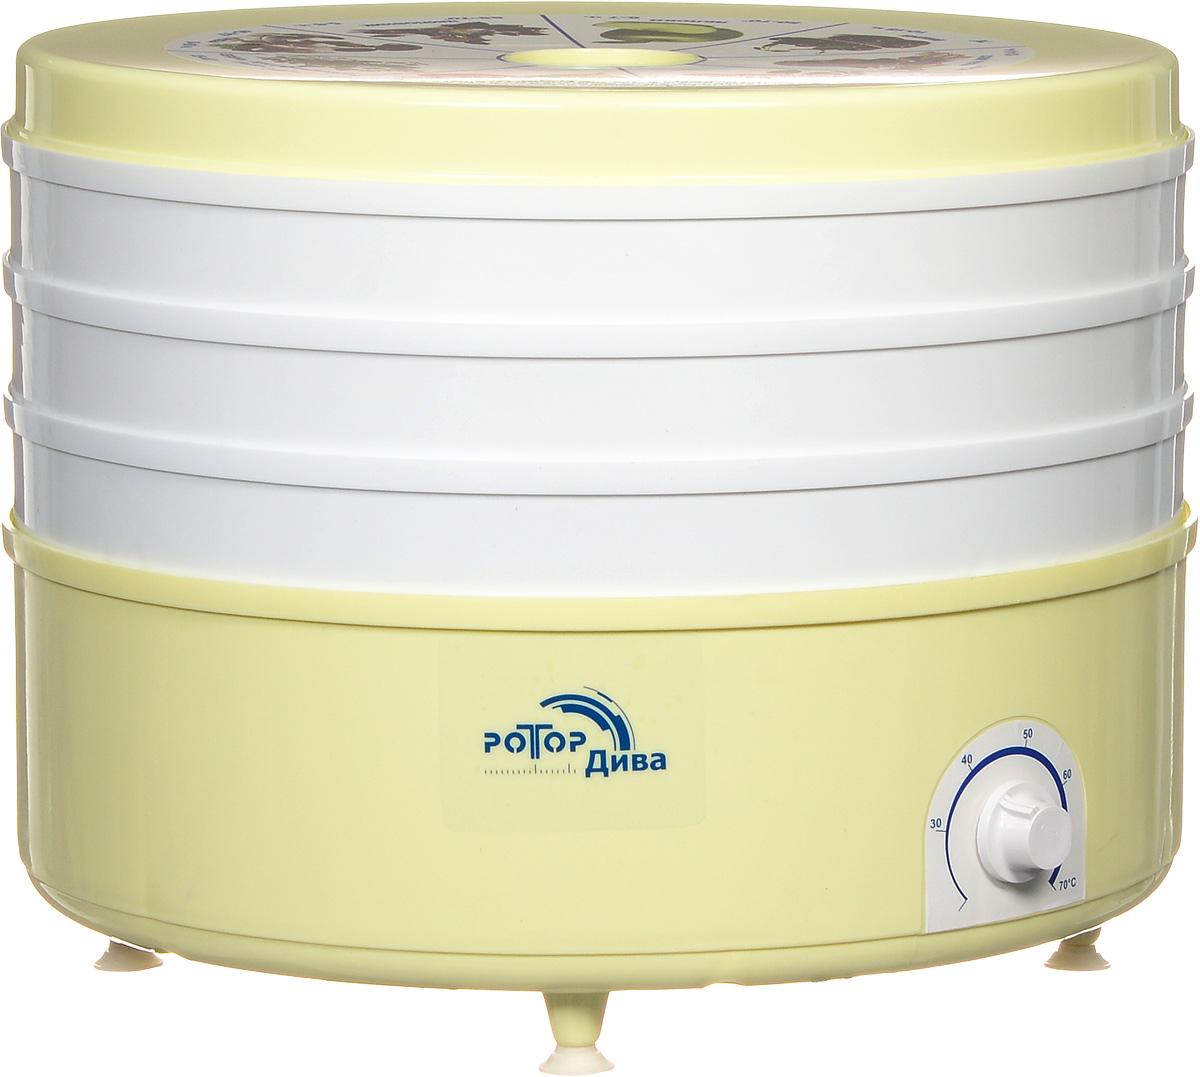 Дива СШ-007-05 сушилка для овощей сушилка для овощей и фруктов ротор сш 007 06 сш 007